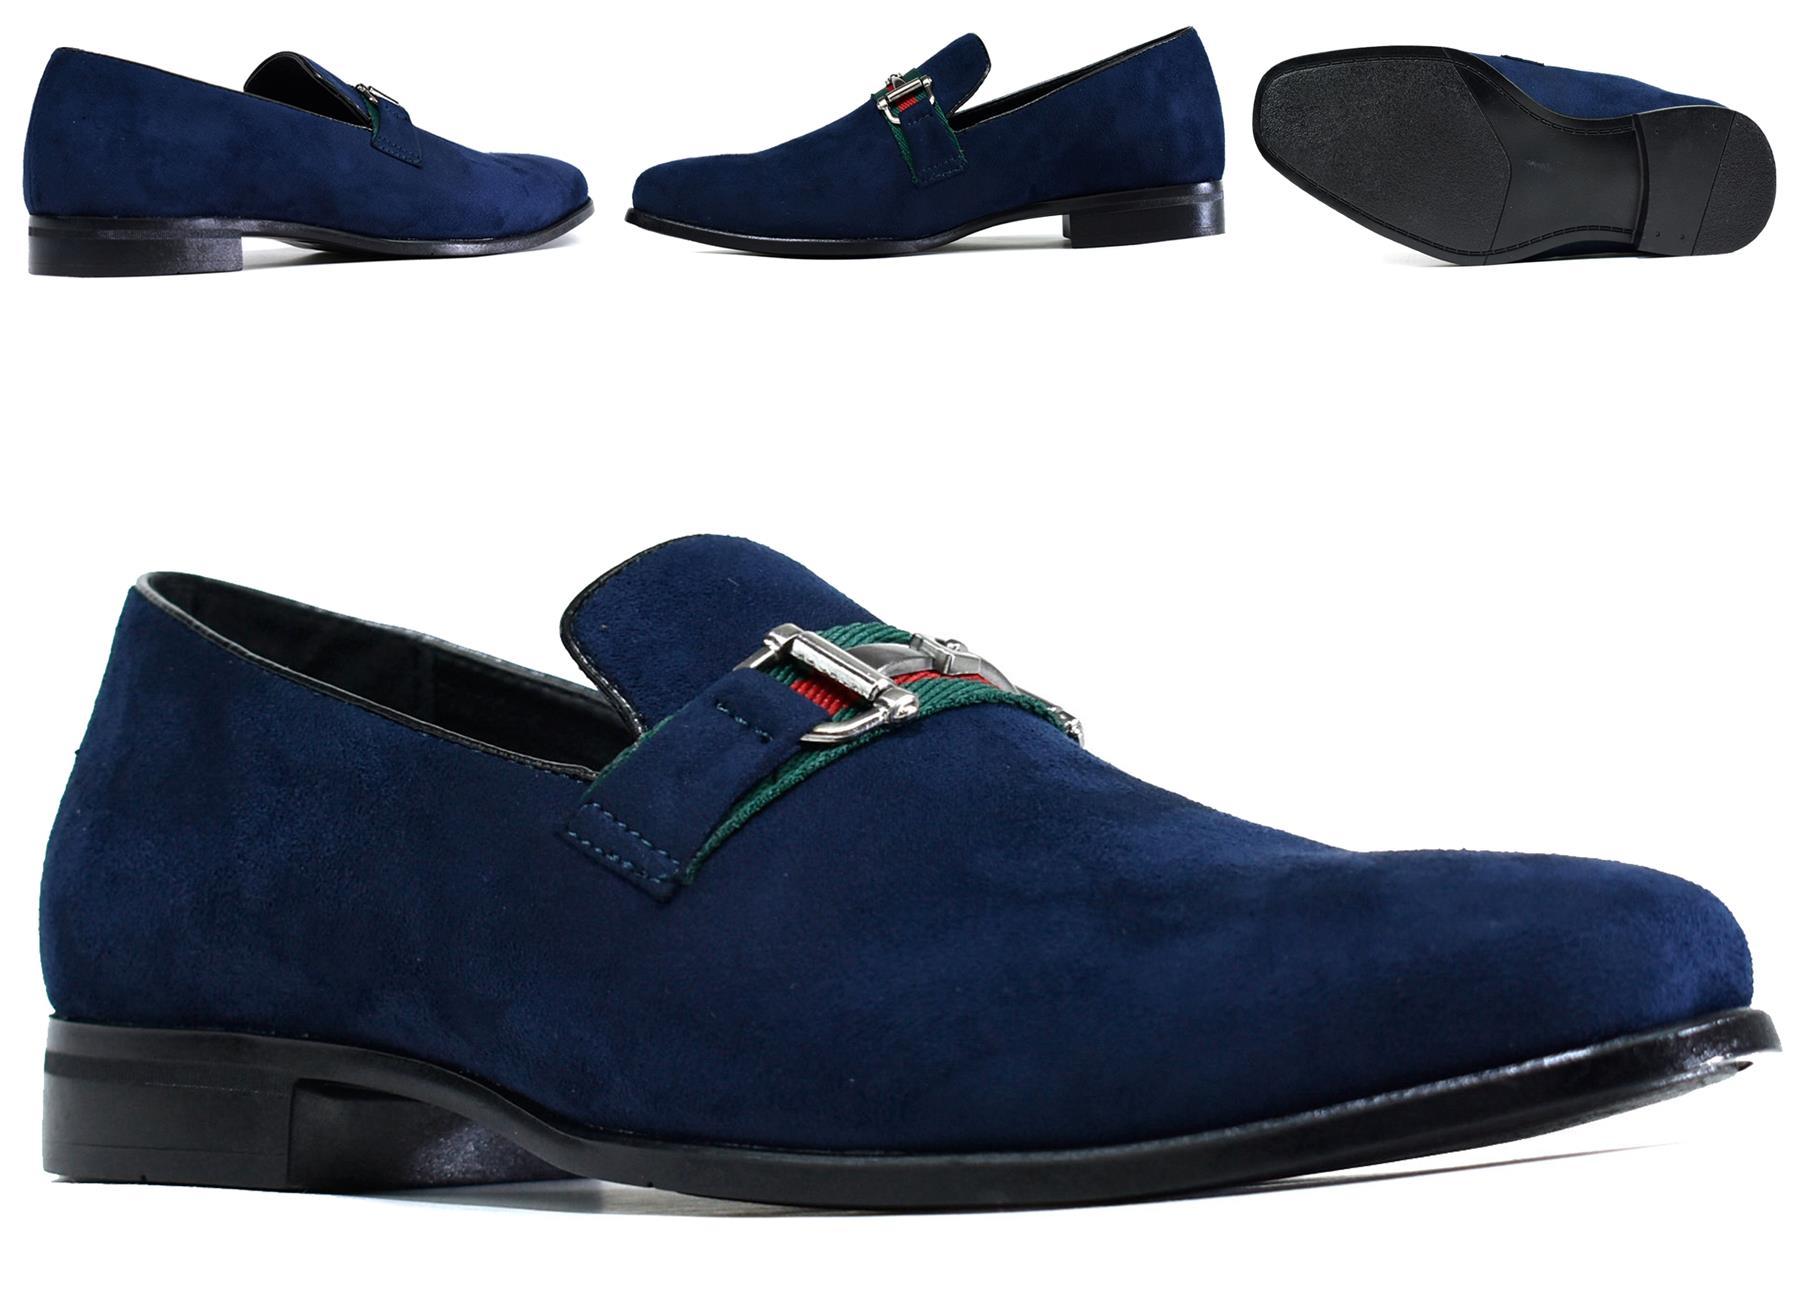 Classique Men Smart Front Stylish Buckle New Slip On Shoes UK Size 6-12